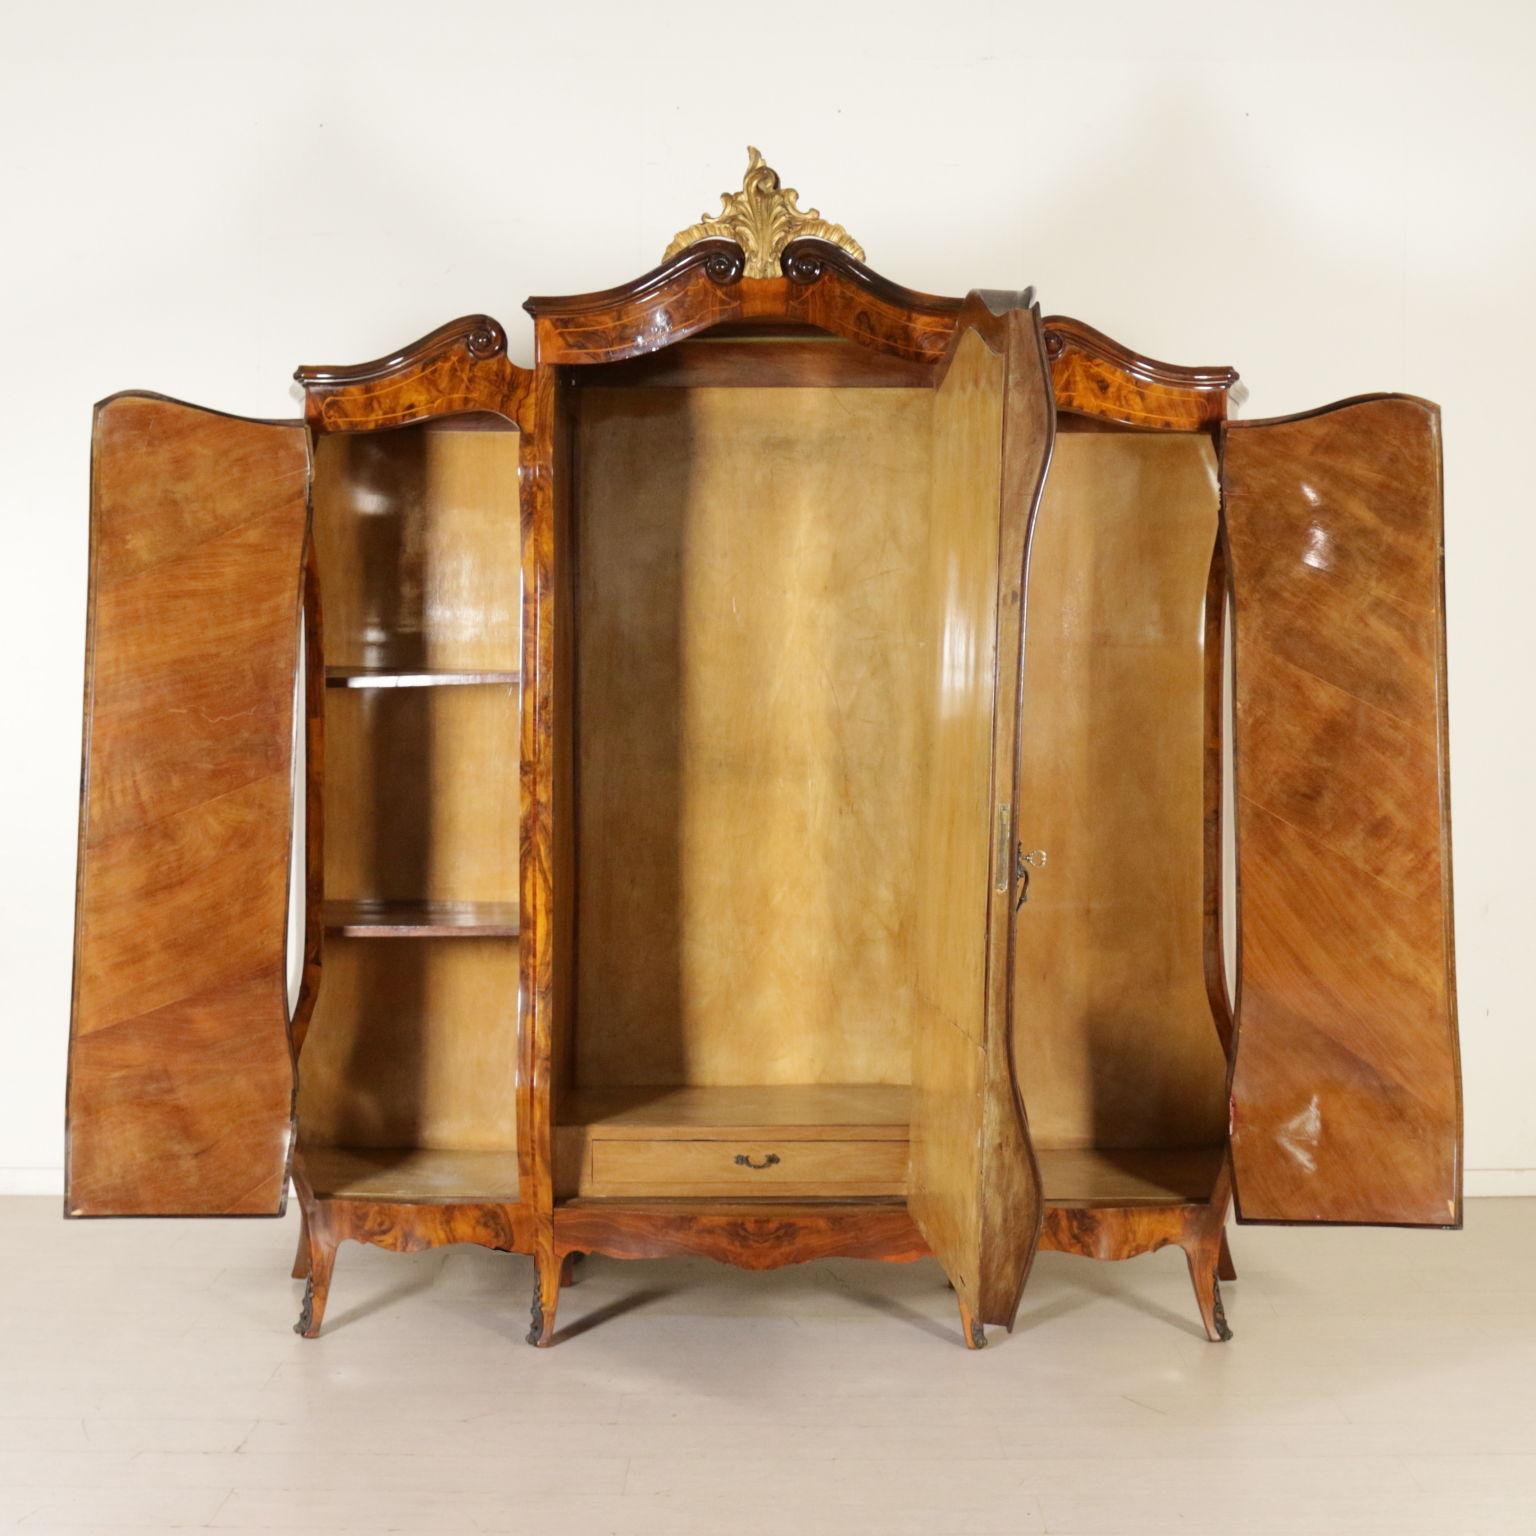 schlafzimmer komplett 50er jahre schlafzimmer mintgr n. Black Bedroom Furniture Sets. Home Design Ideas